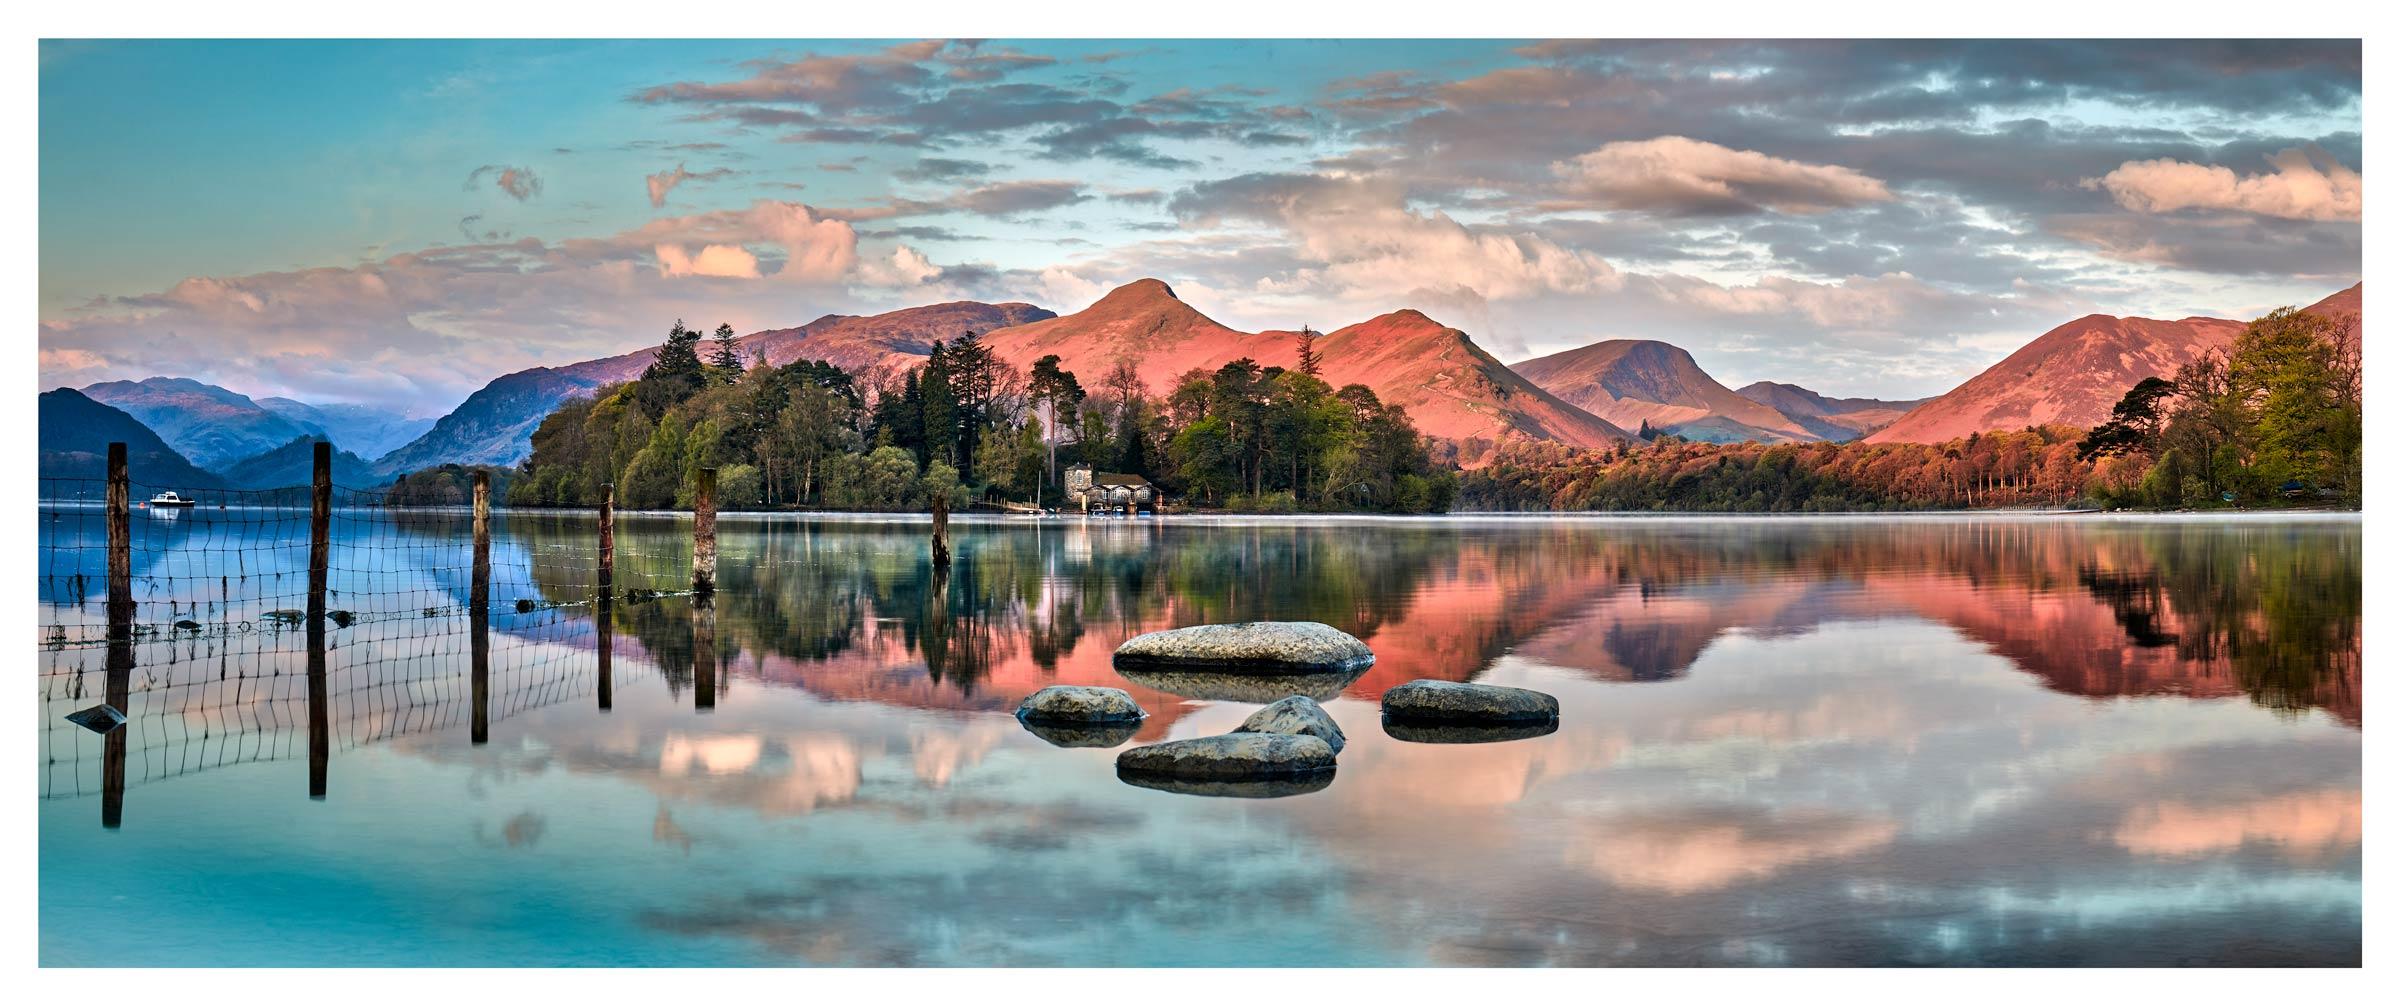 Forum on this topic: Grace McDonald, dawn-lake/